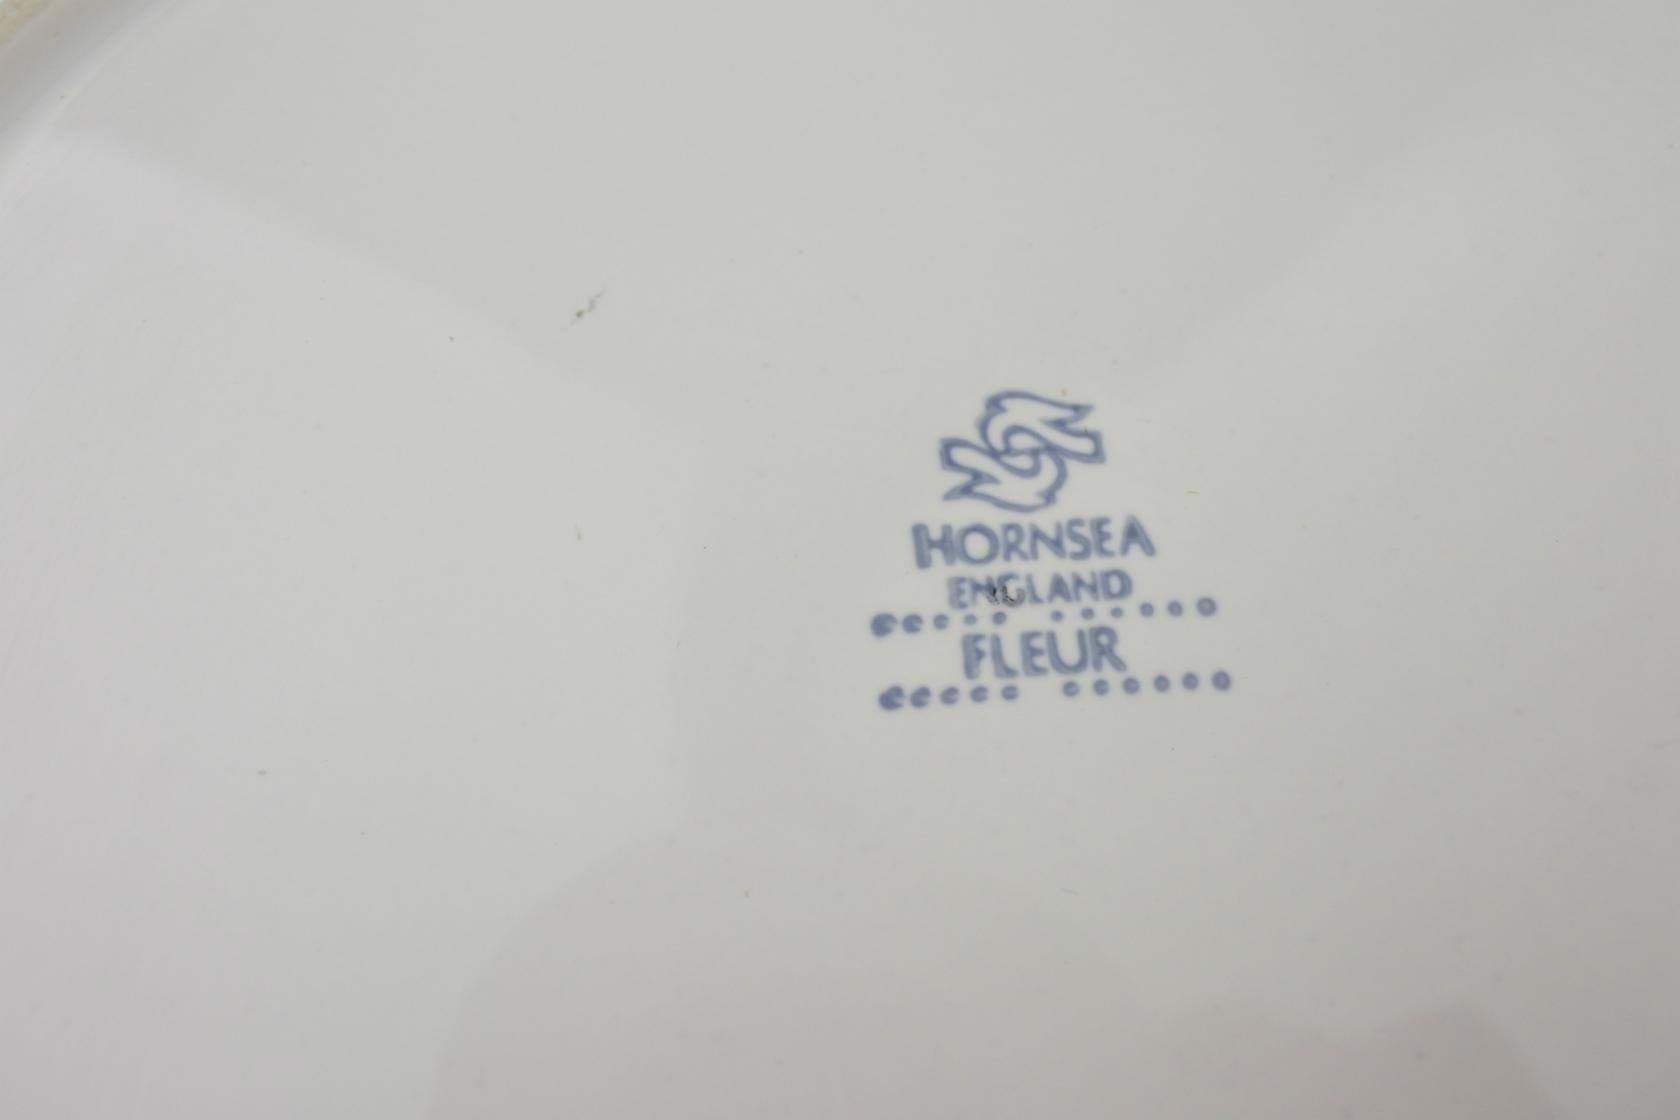 vi-hornsea-fleur-17